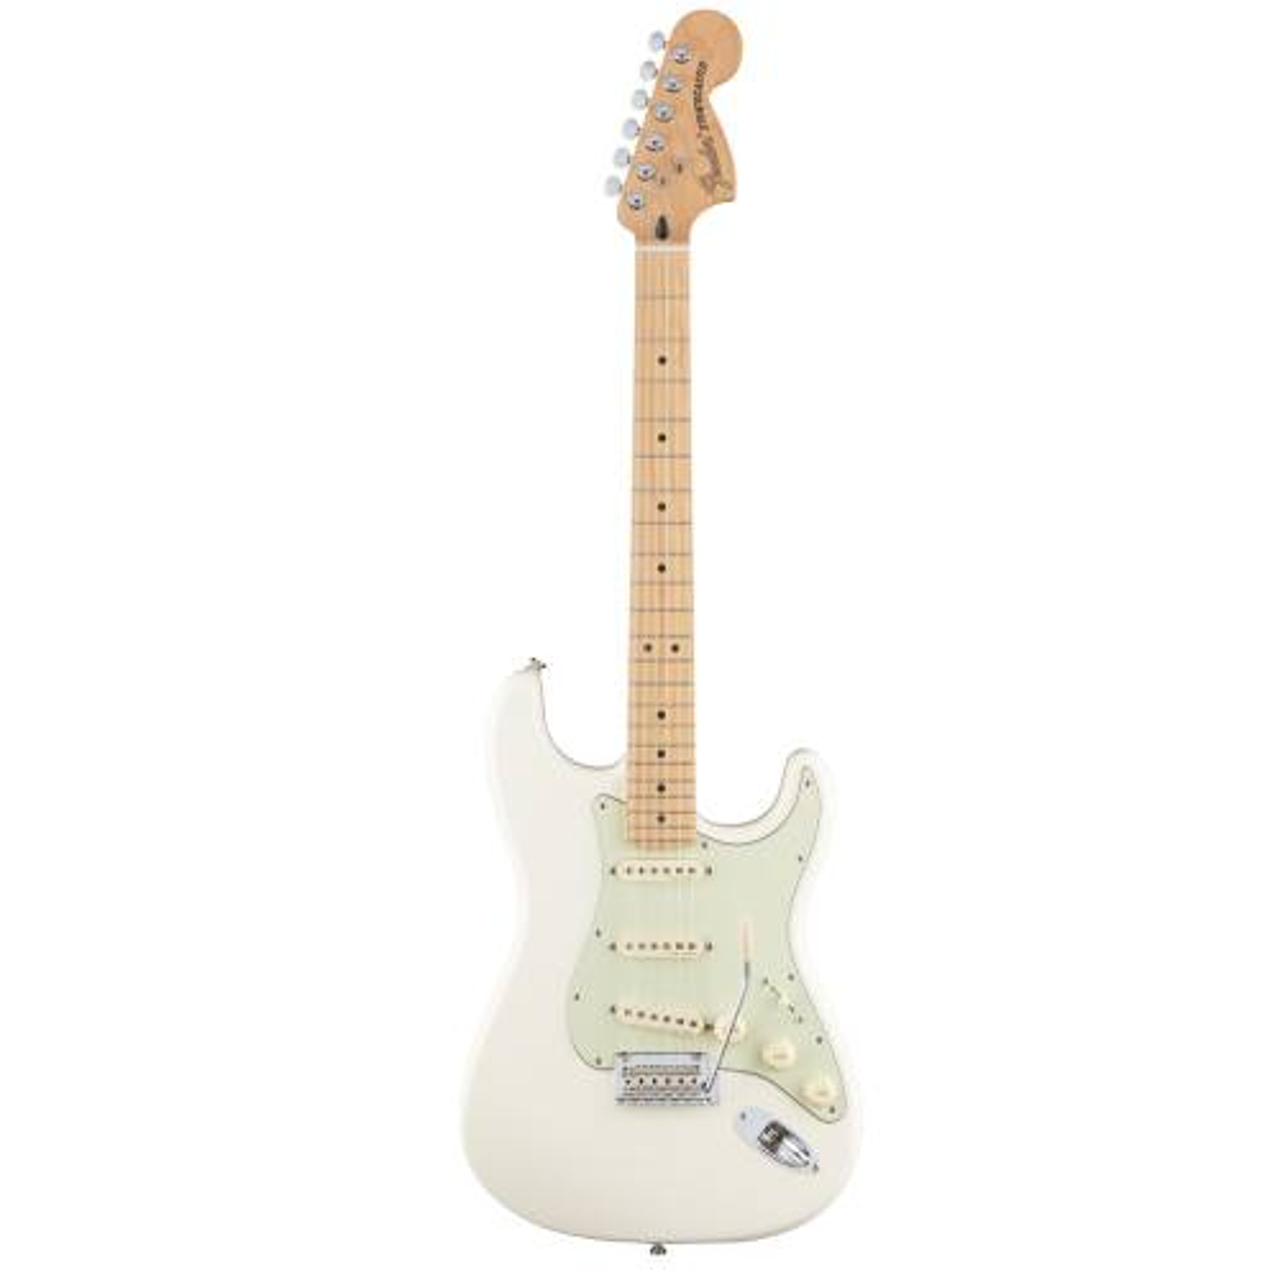 گیتار الکتریک فندر مدل Deluxe Roadhouse Stratocaster MN Olympic WhiteElectric